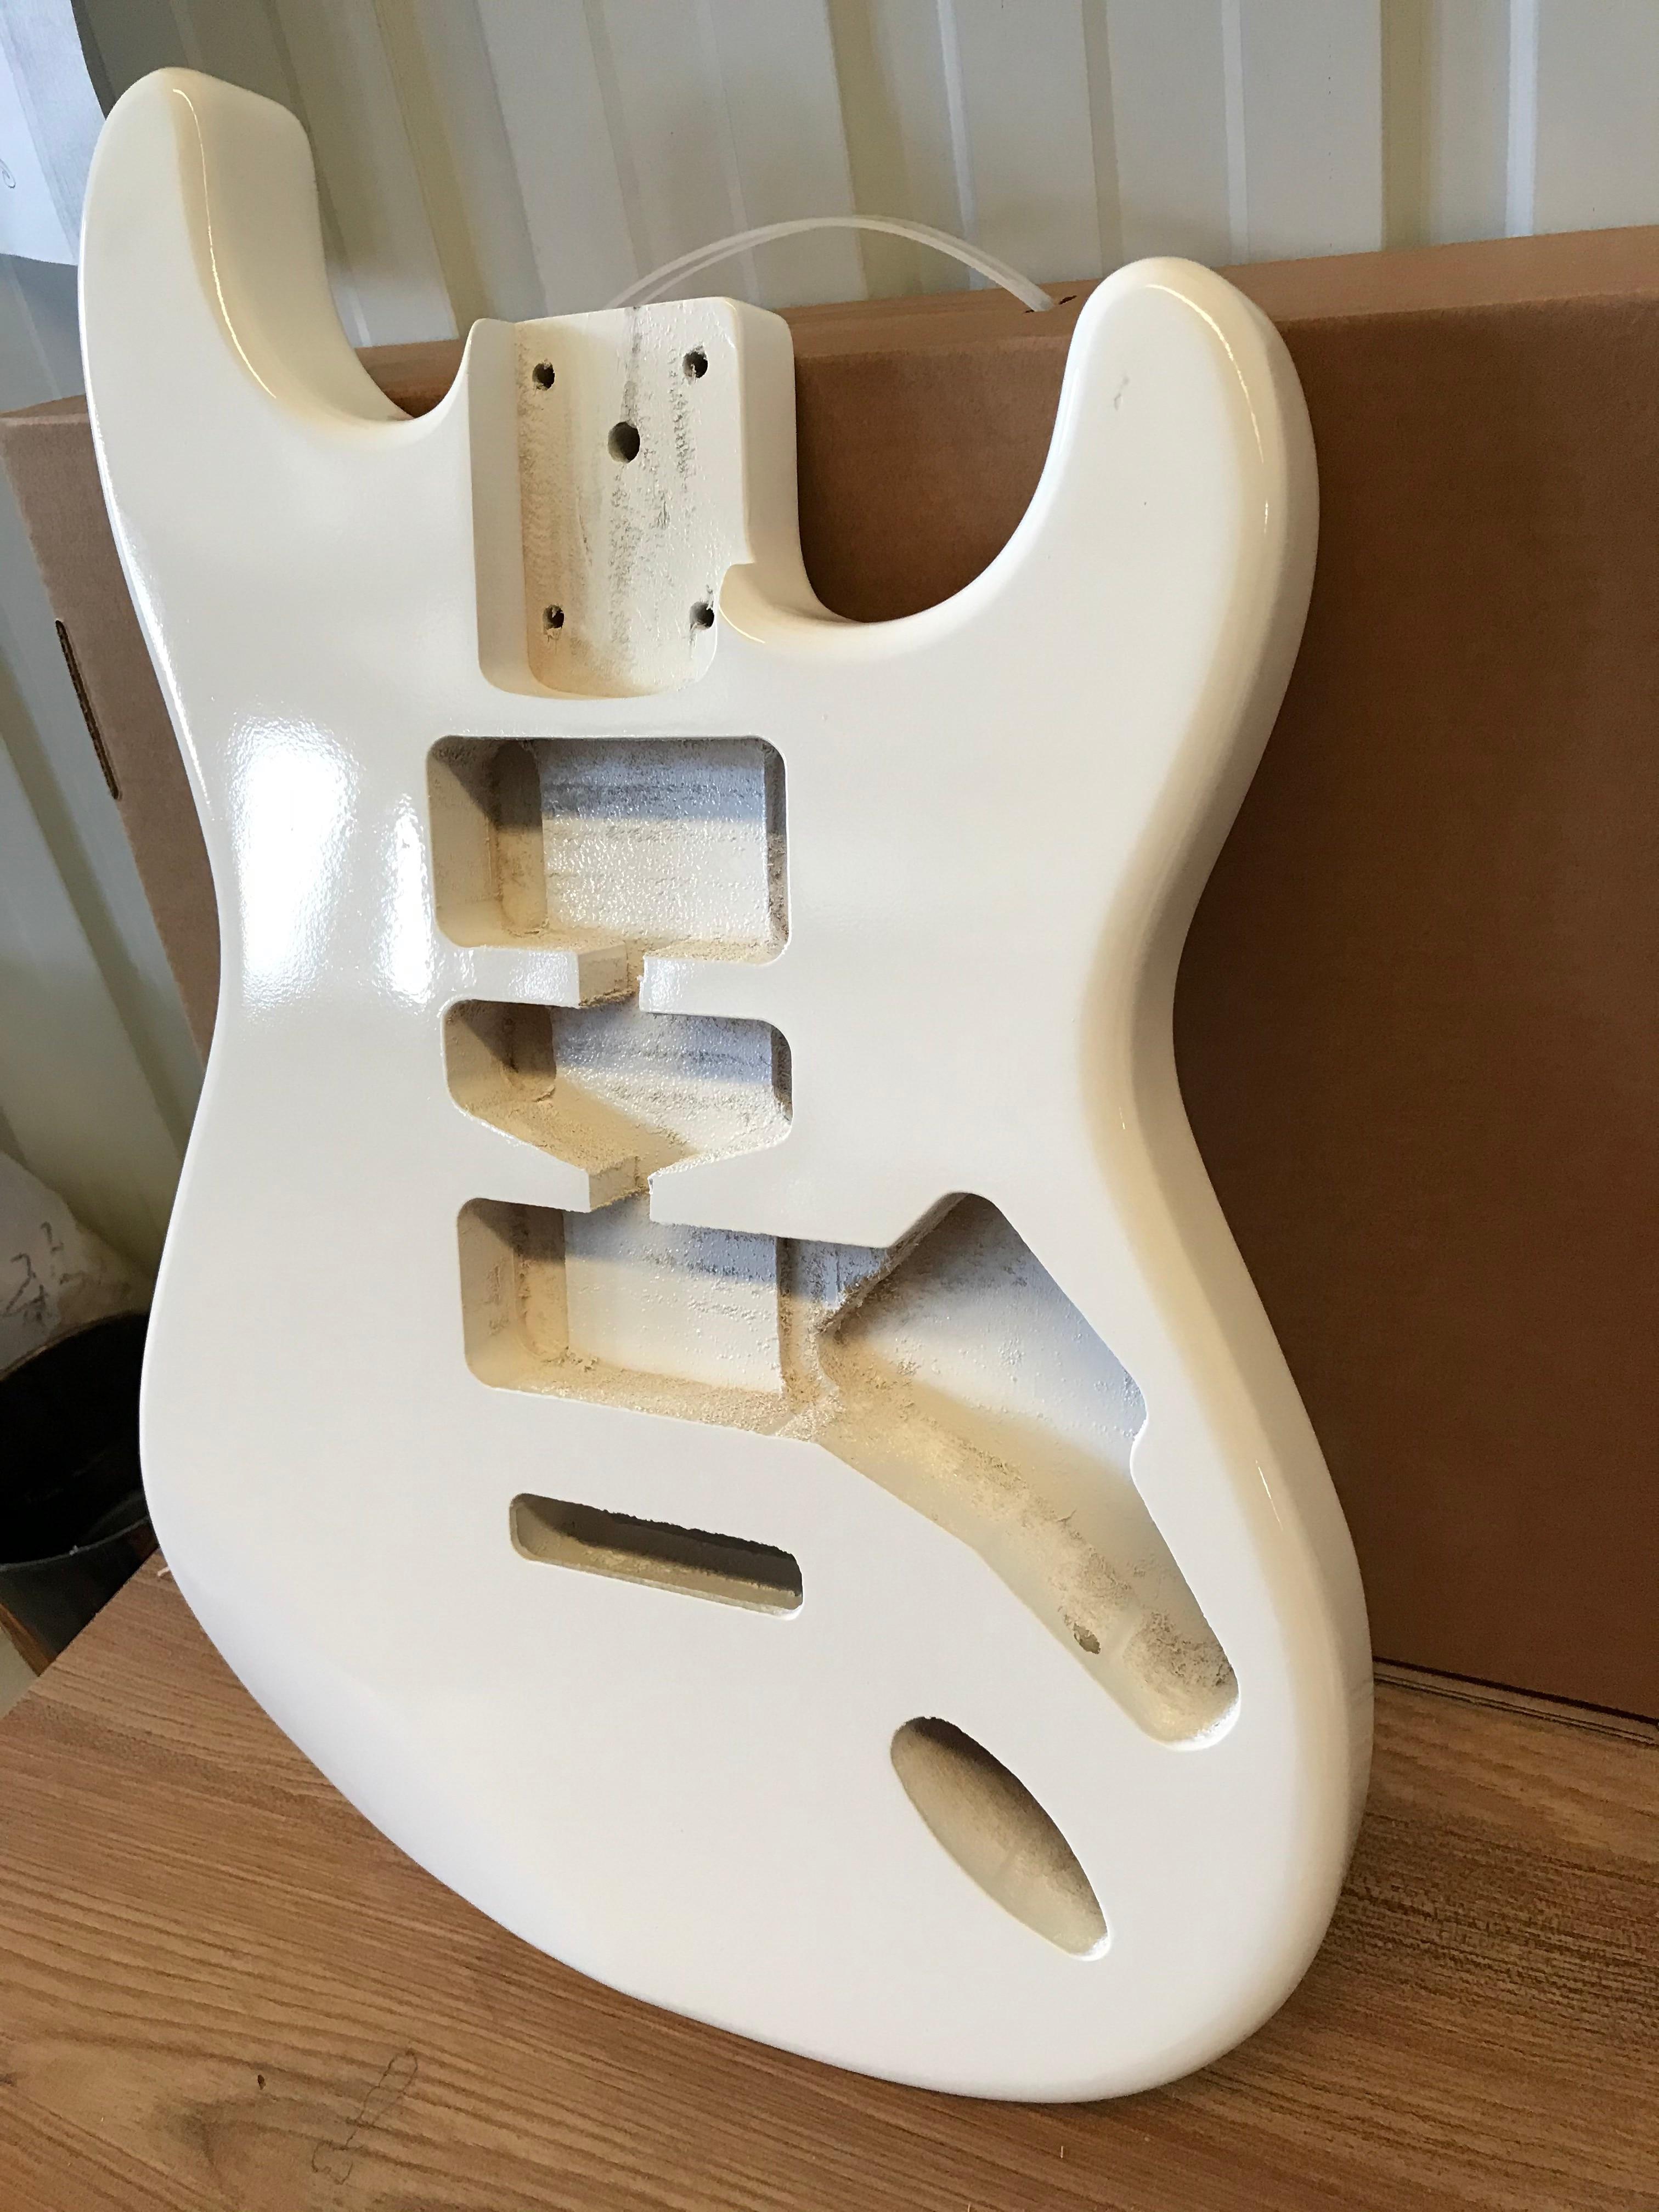 ST Electric Guitar Body Poplar Wood Electric Guitar Panel Strat Body ST Barrel Free Shipping enlarge